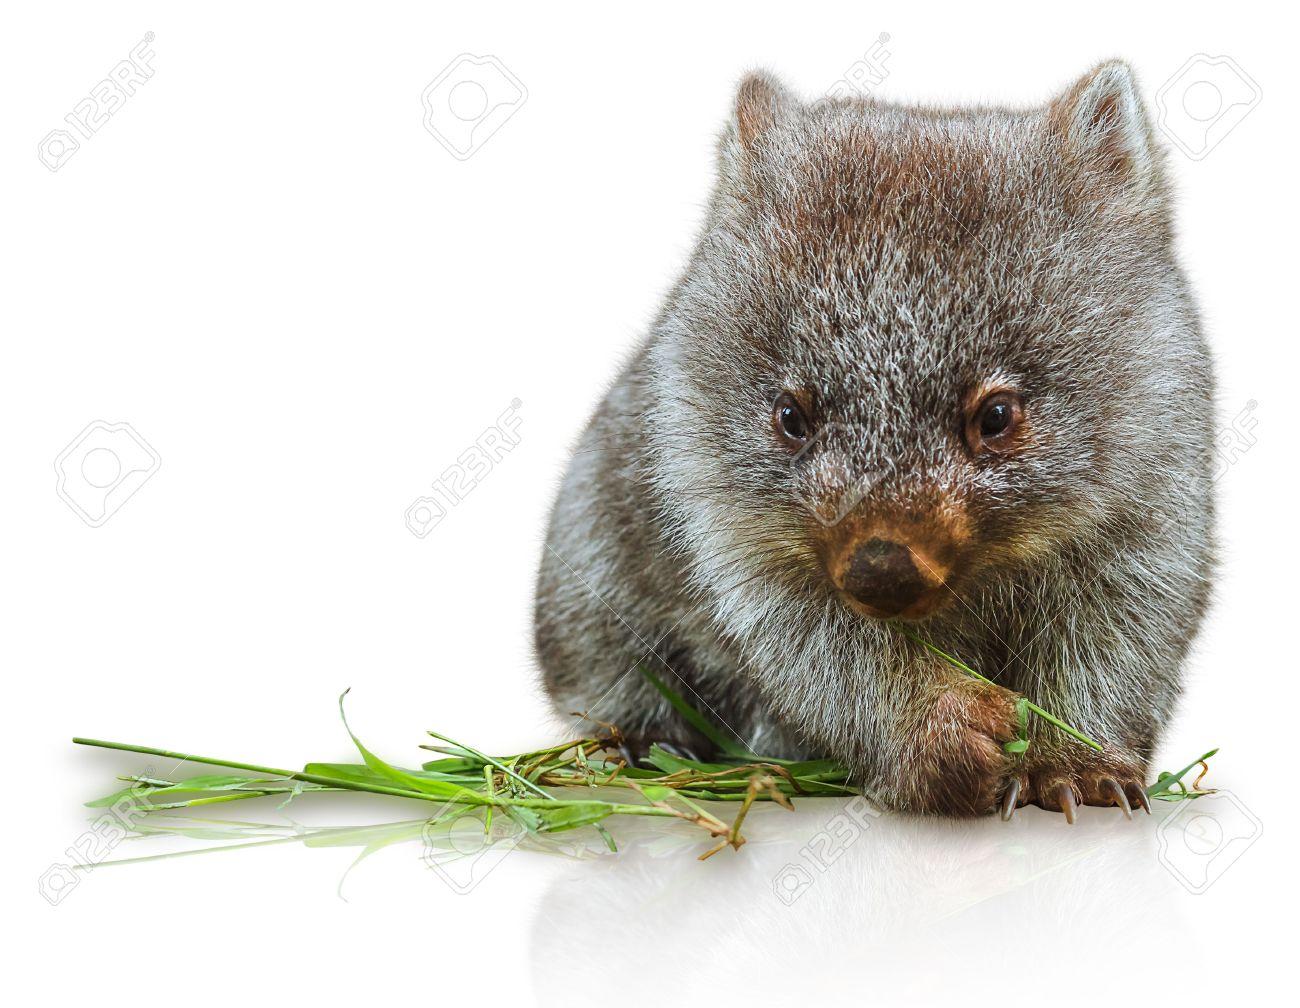 Wombat clipart cute Fans wombat clipart 62 Clipart